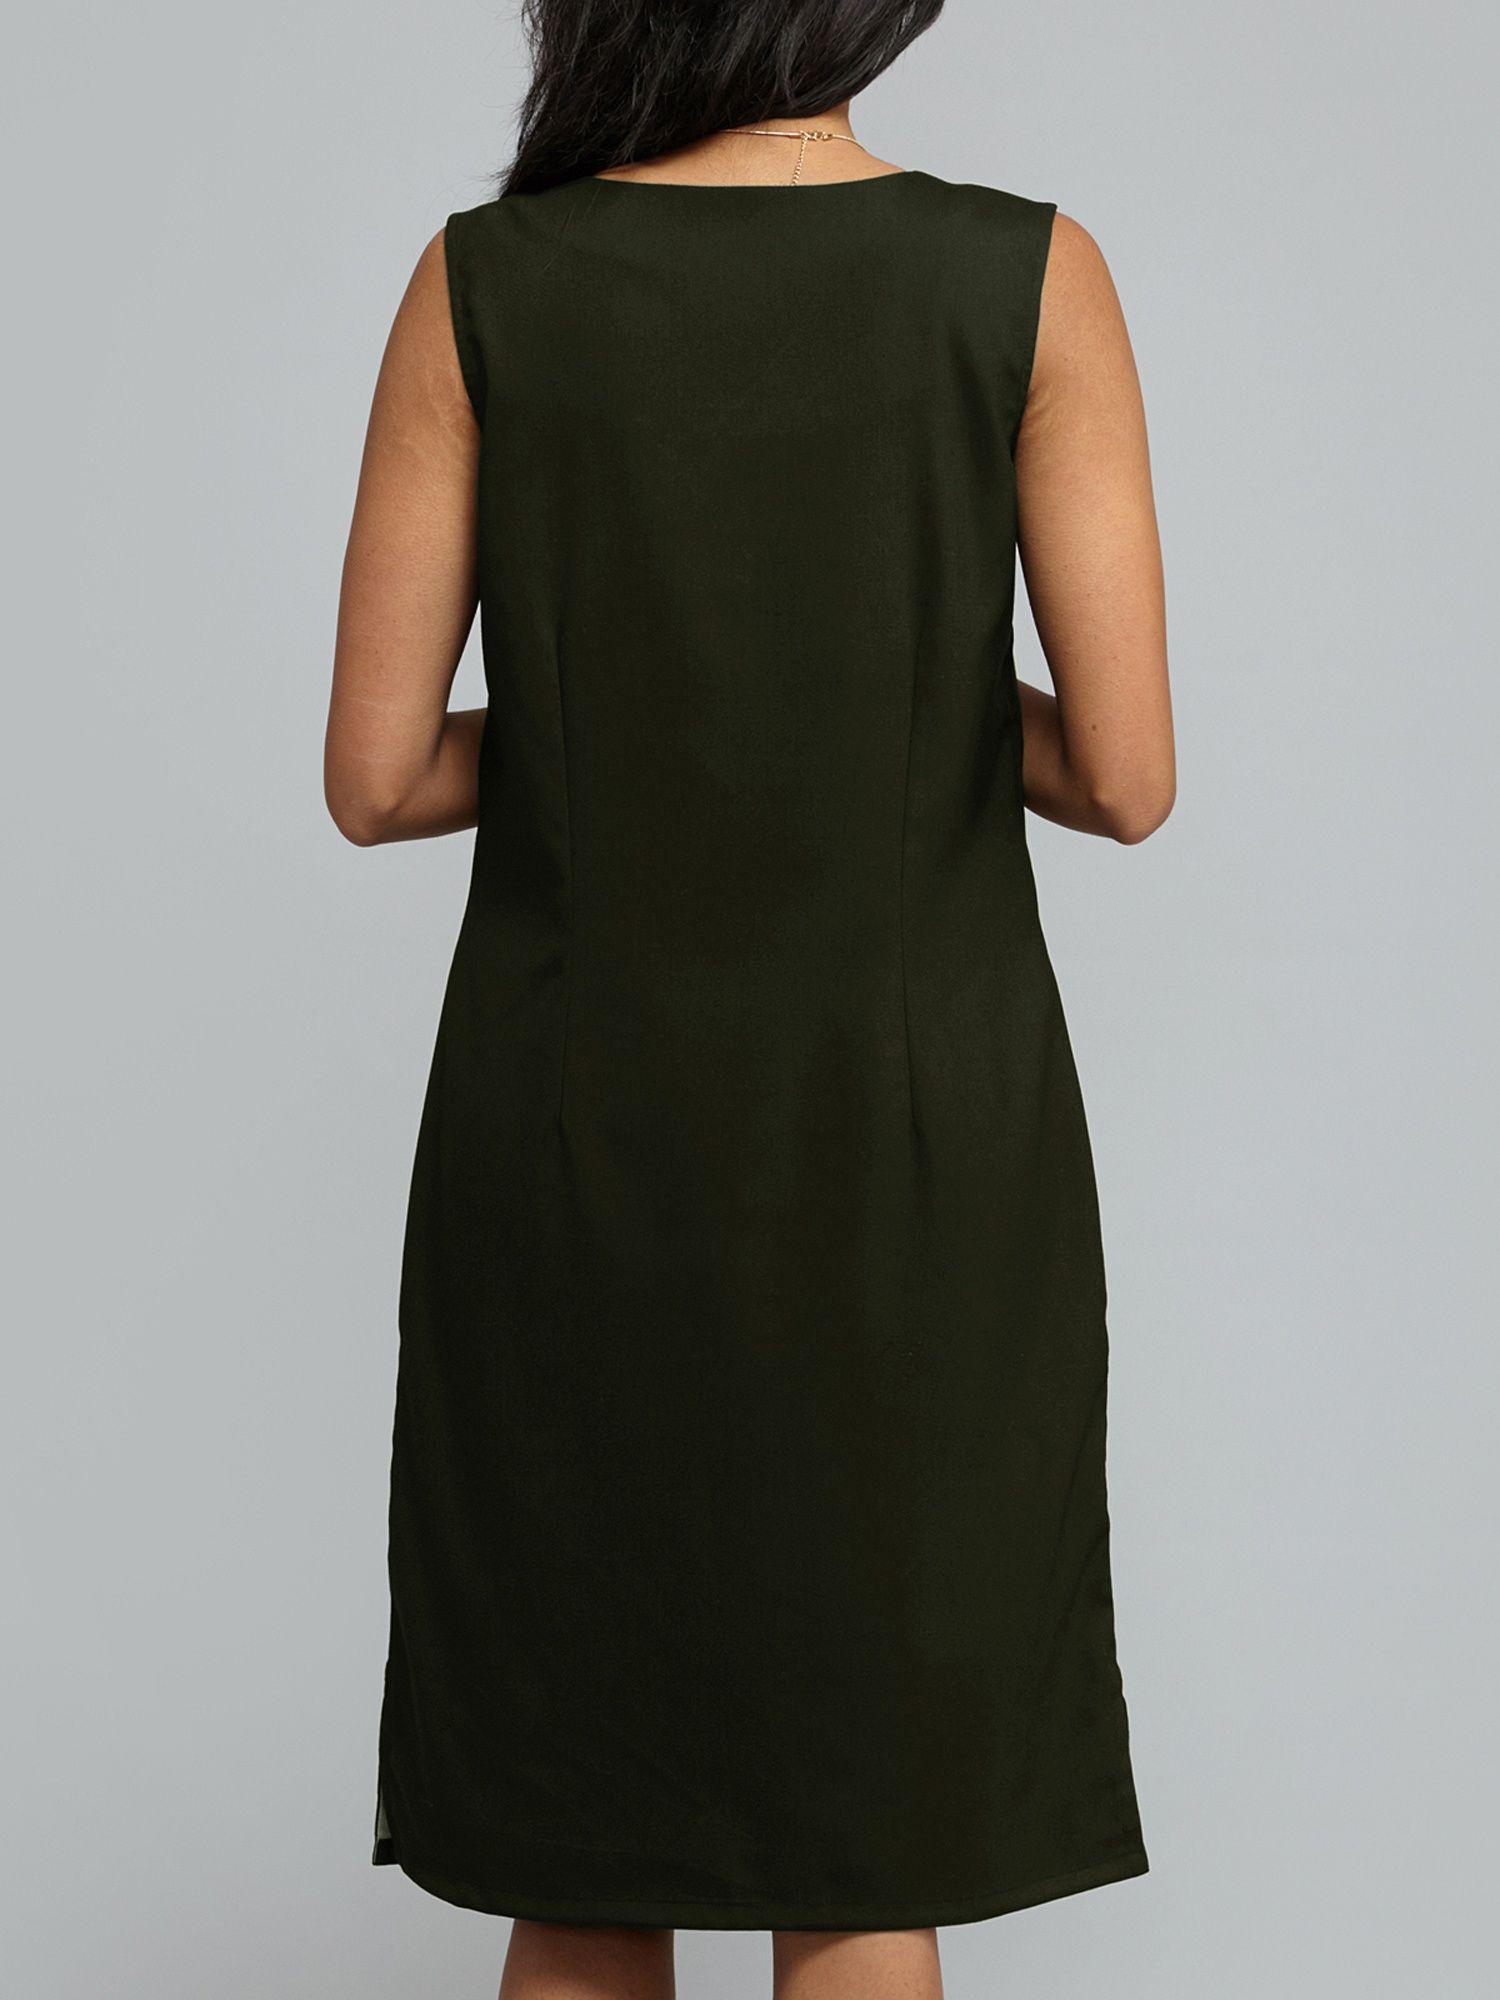 44ddfd8c02 FableStreet Dresses   Buy FableStreet V Neck Shift Dress - Seaweed ...